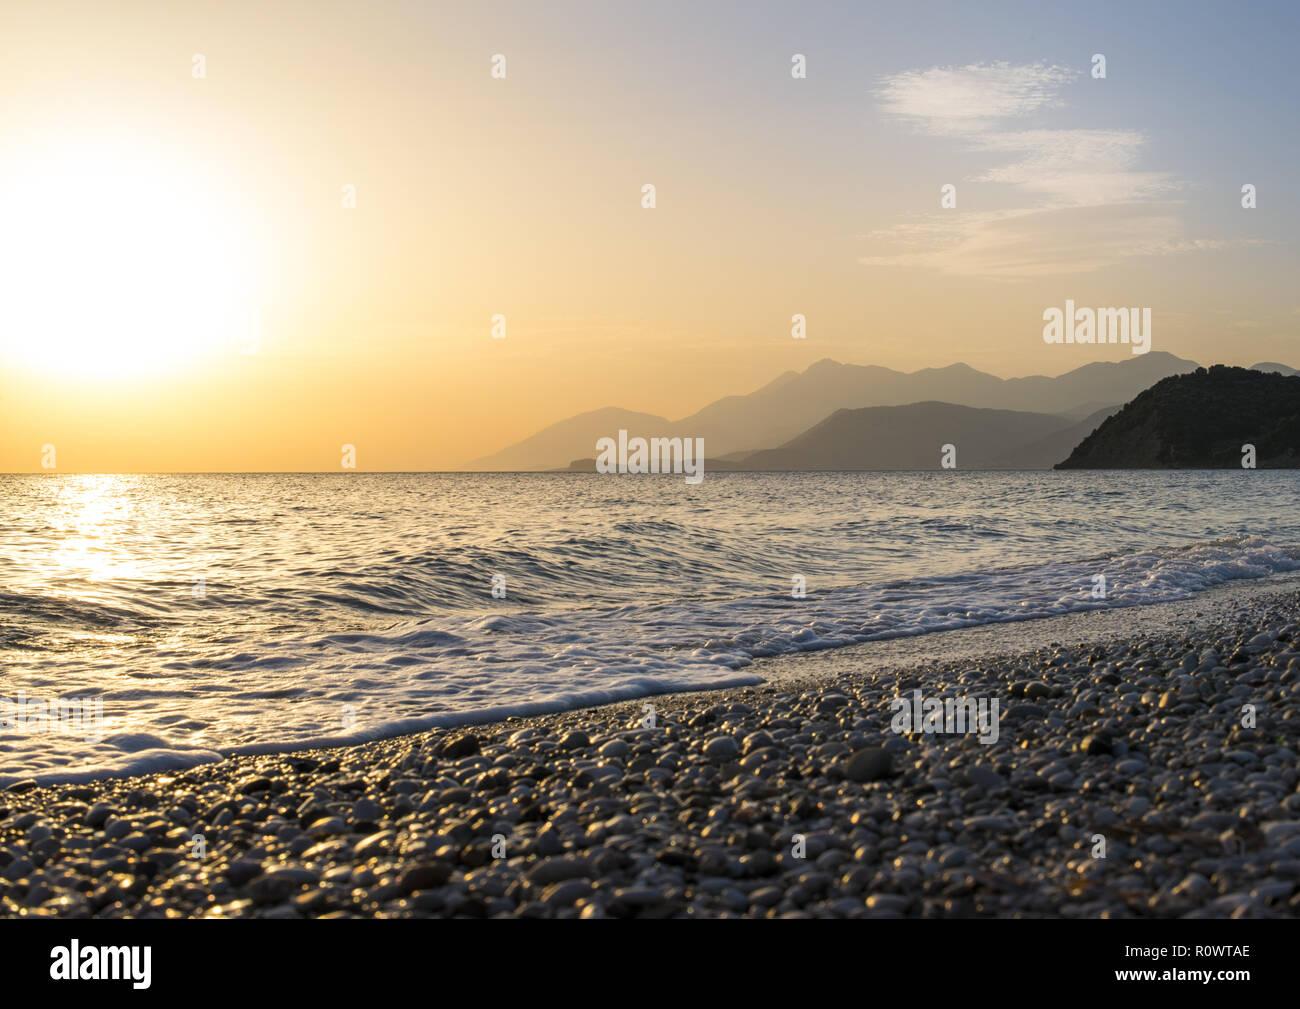 Sonnenuntergang am Strand, Lukova, Albanien - Stock Image